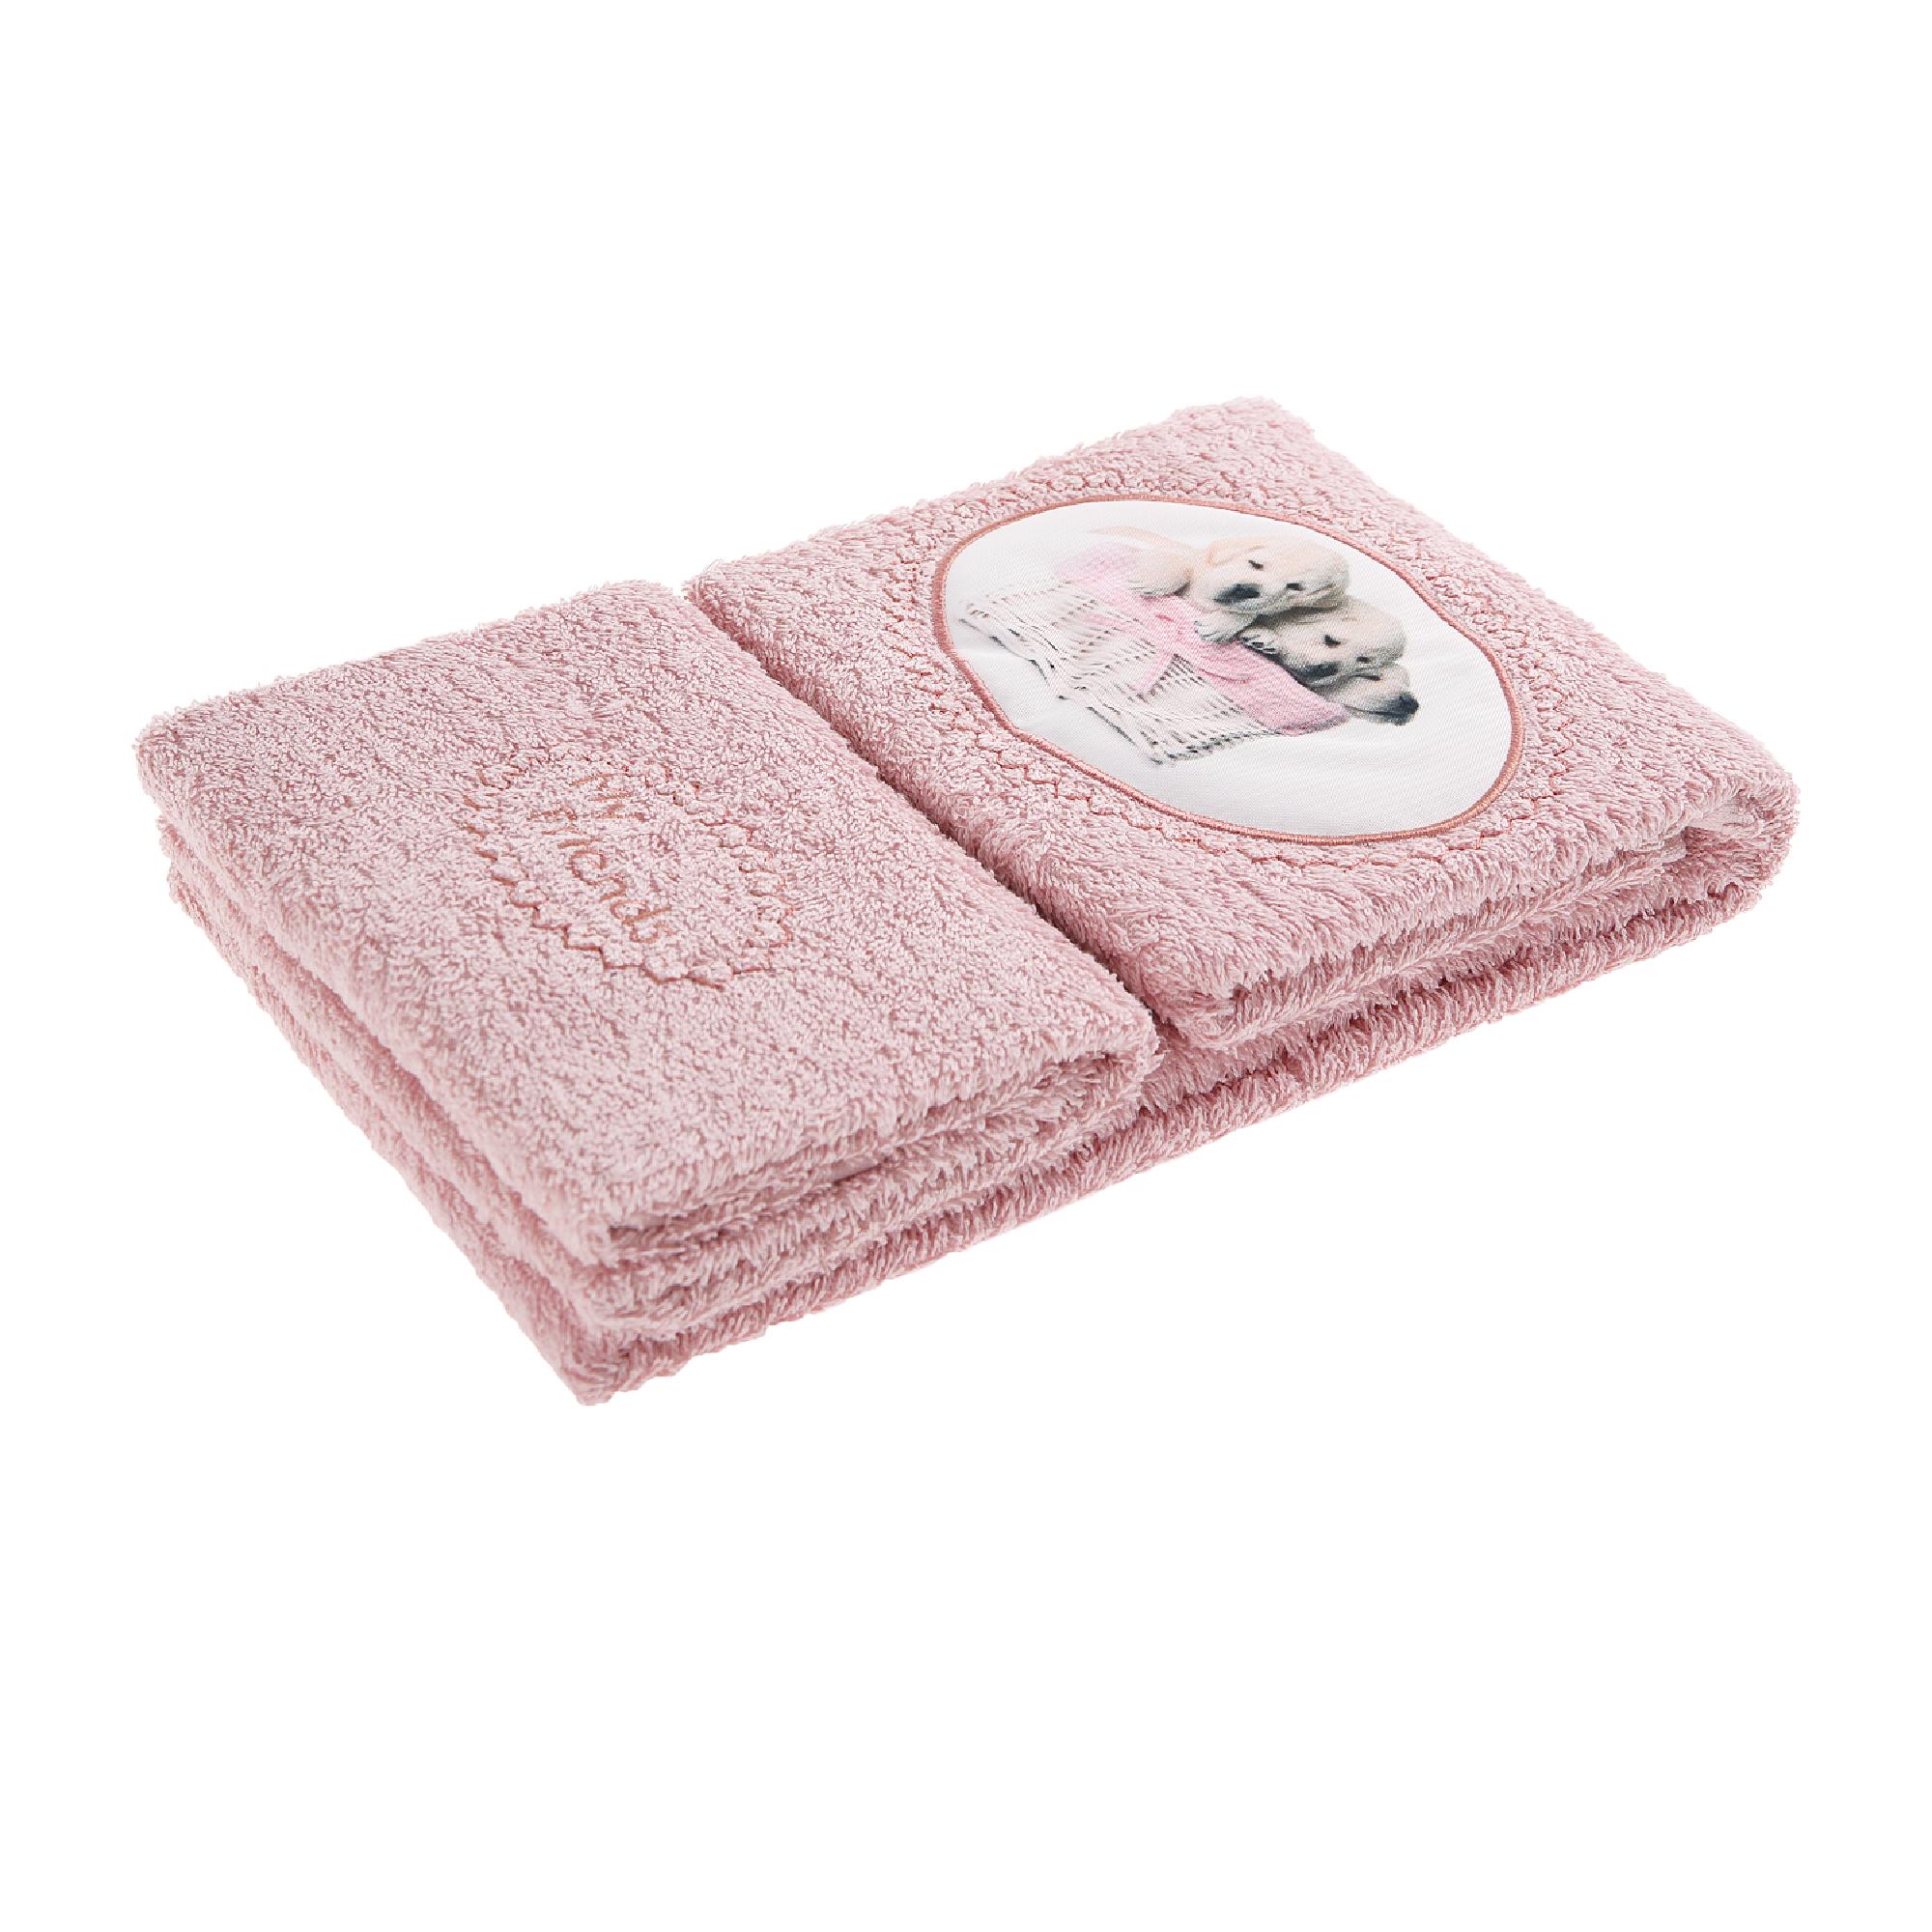 Набор полотенец Almatex Самоа-АТ розовый 2 шт полотенца honda towel набор полотенец в подарочной упаковке regal 34х80 см 2 шт